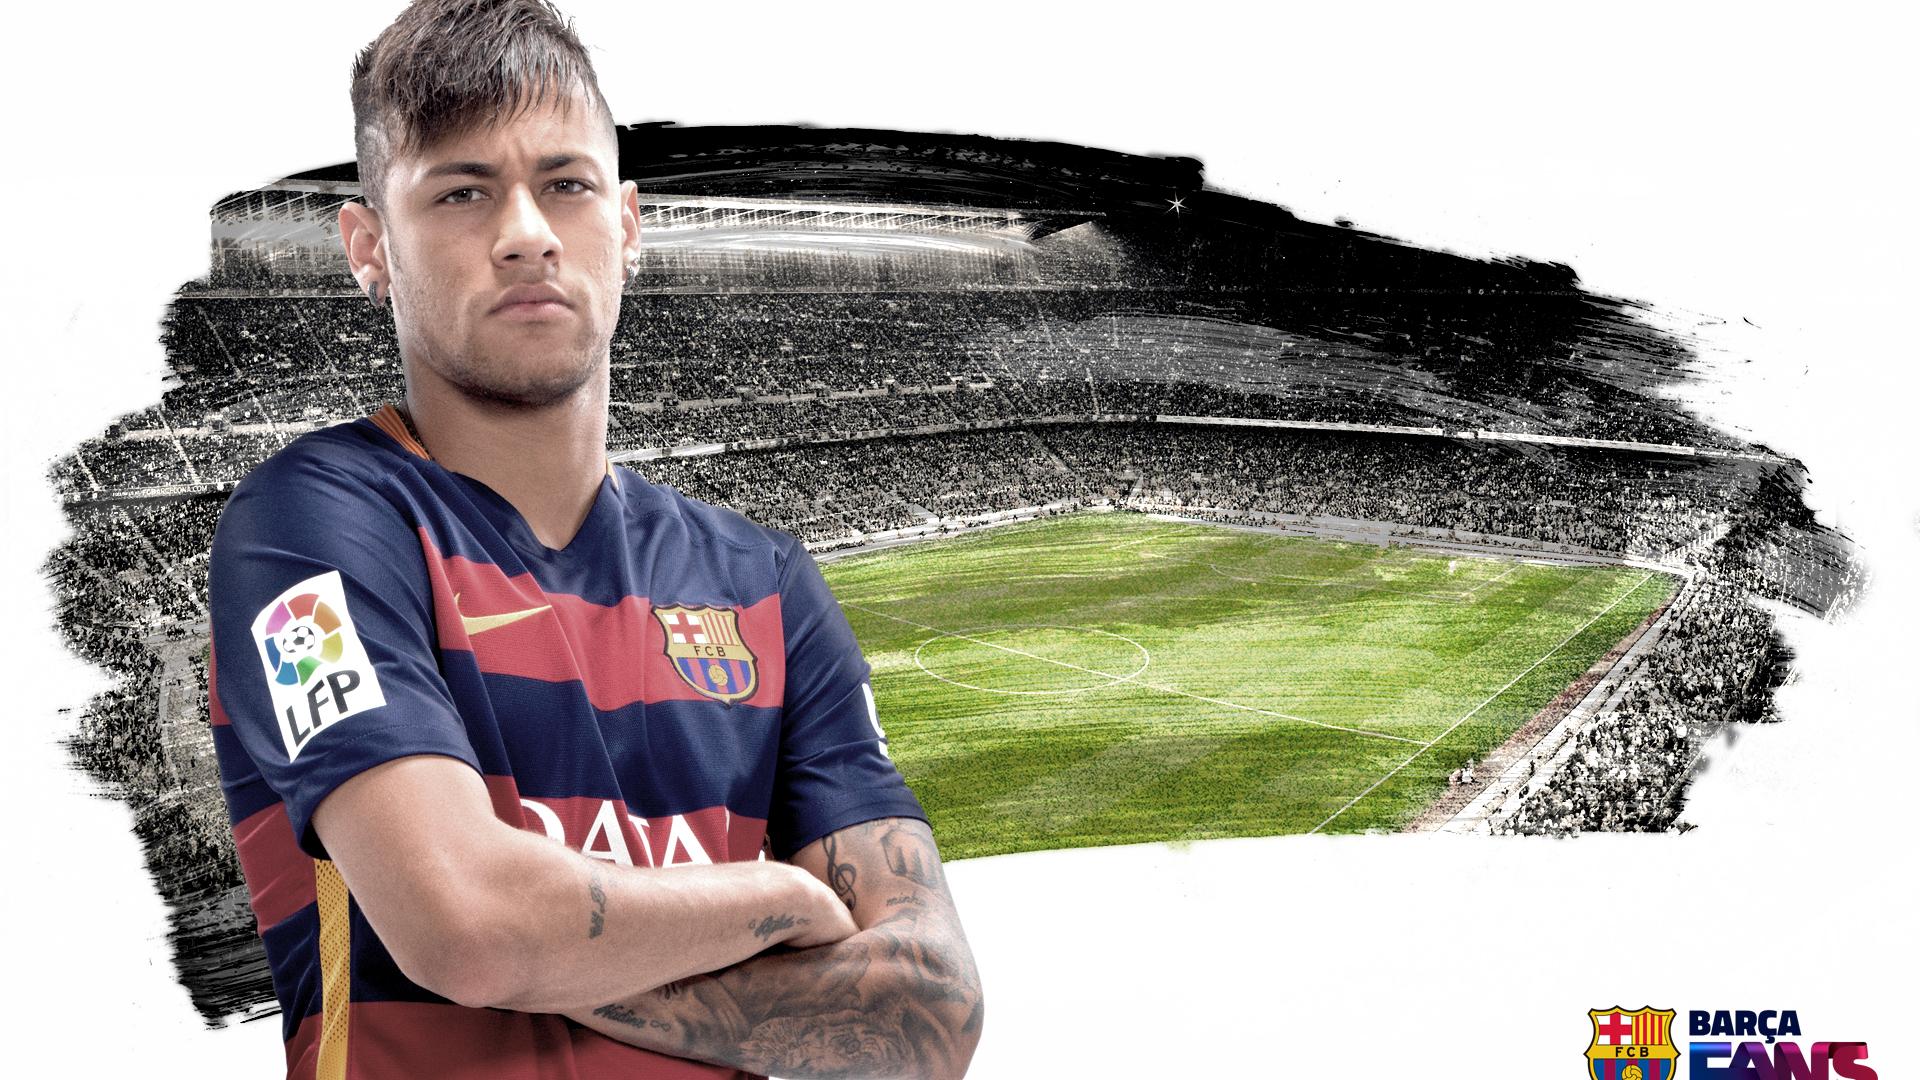 1920x1080 Neymar Jr Fc Barcelona Laptop Full HD 1080P HD ...